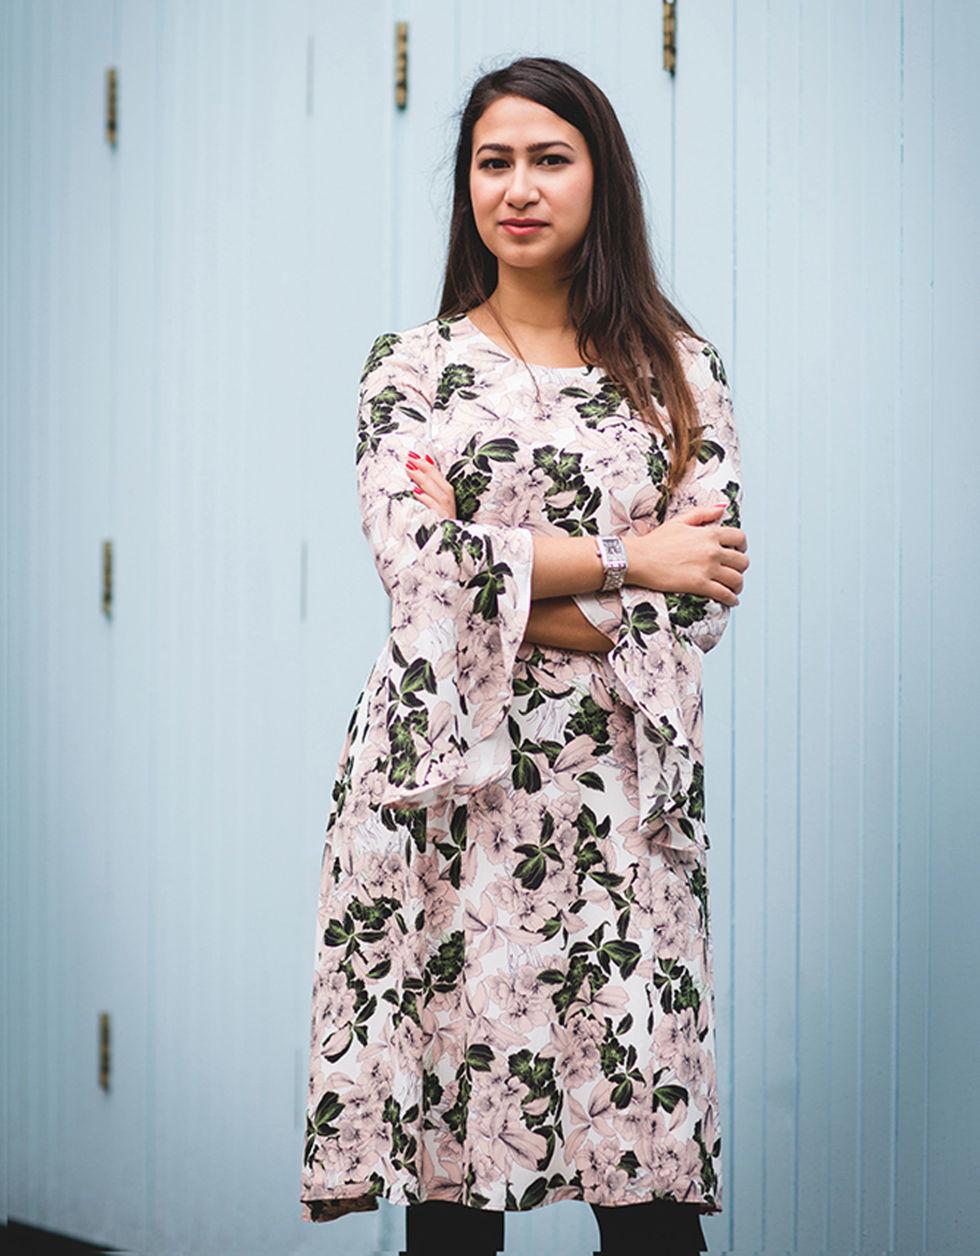 Fatima Zaman photographed by Victoria Adamson